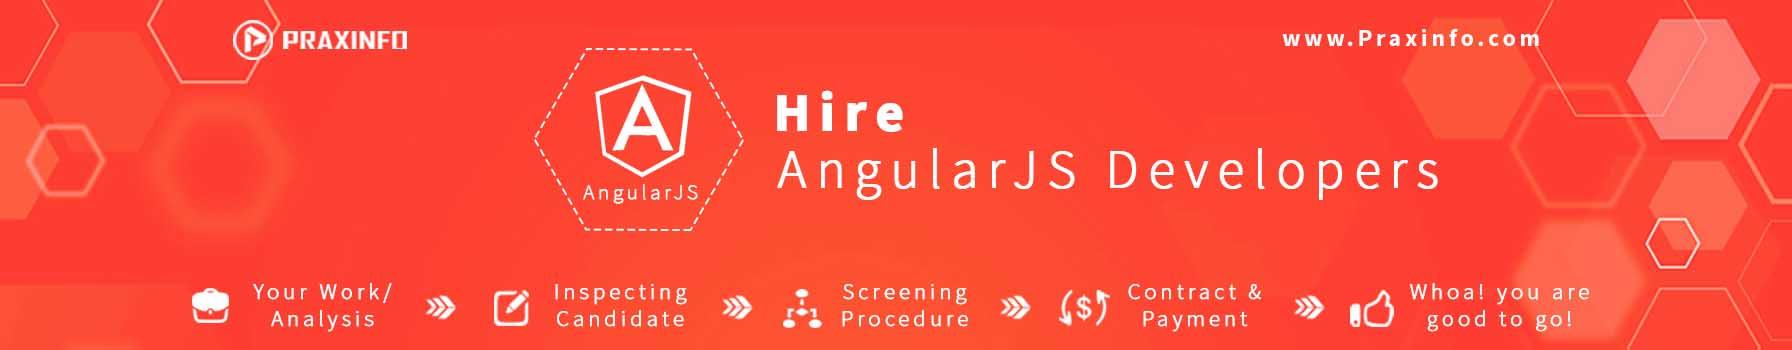 hire-AngularJS-developer.jpg